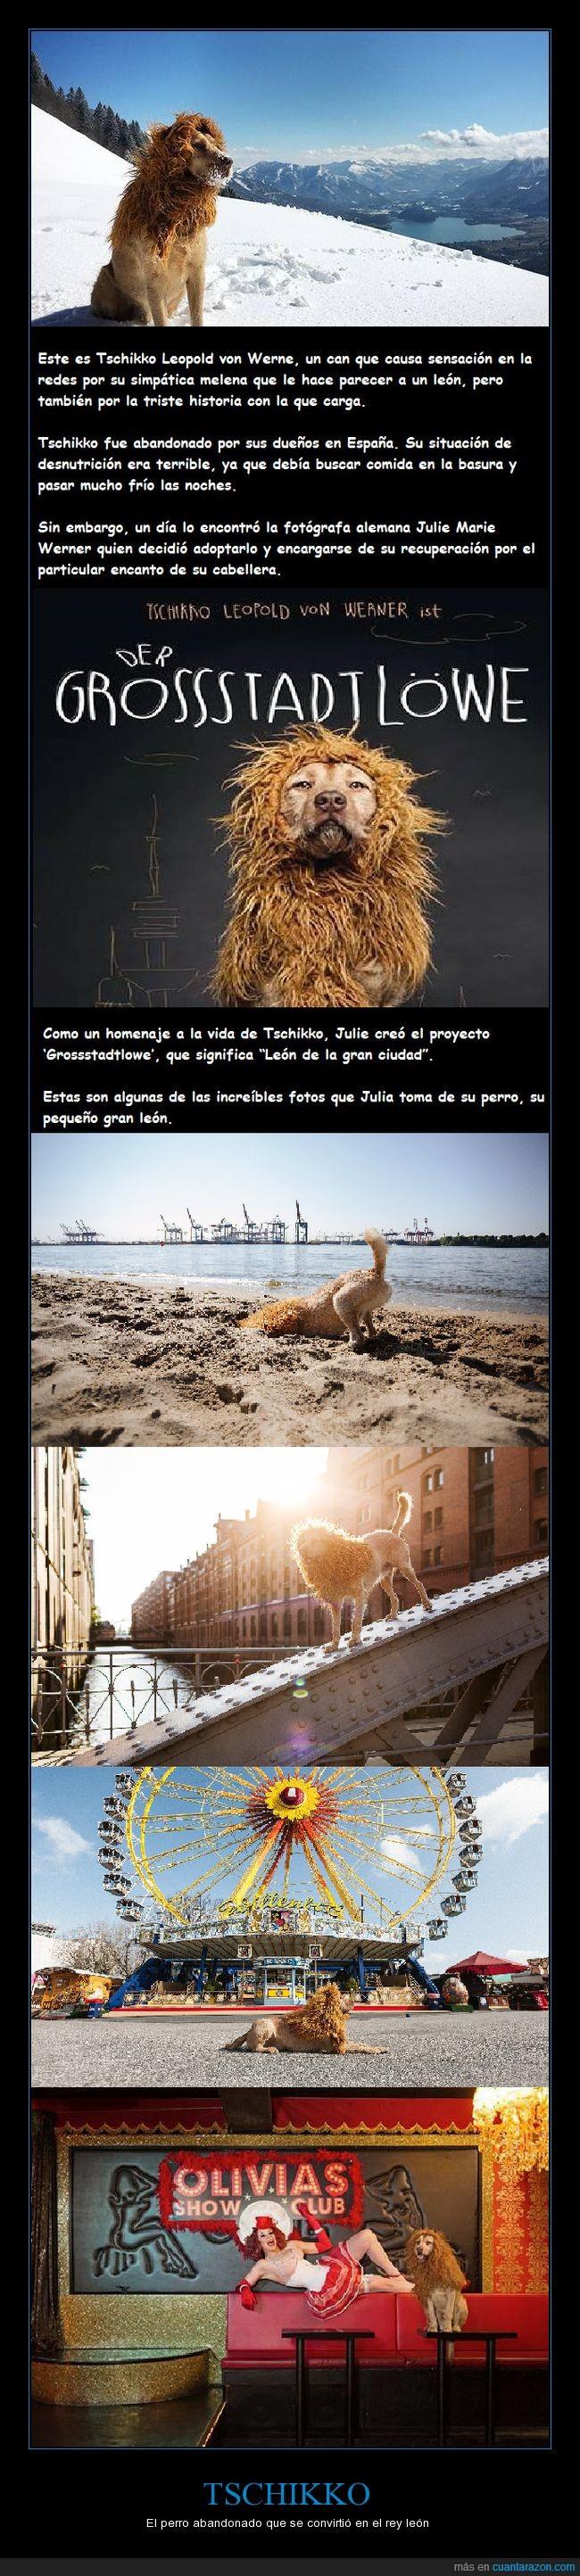 abandono,Alemania,fotografa,león,perro,rescate,Tschikko